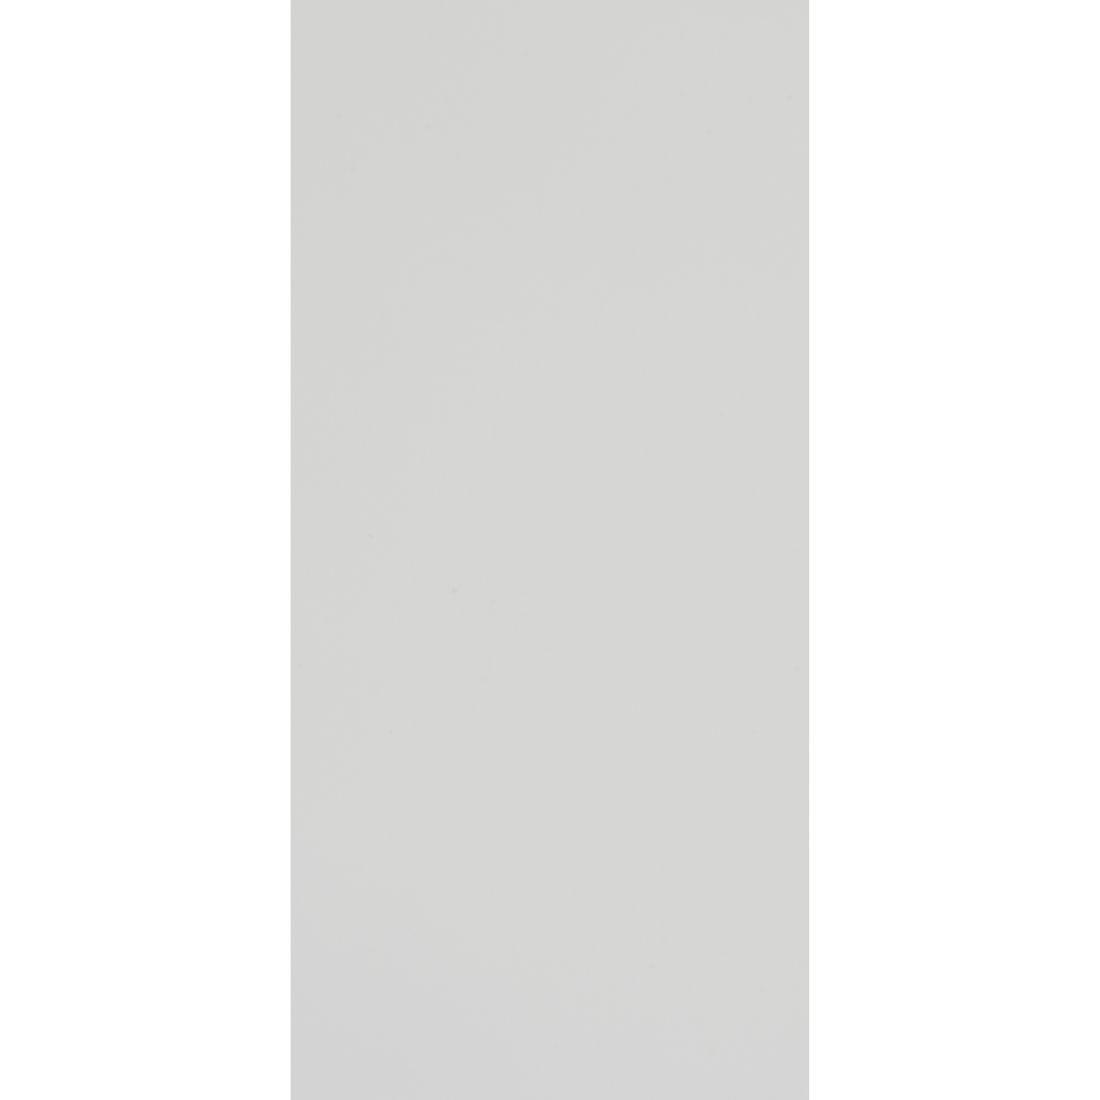 Classic Wall Lining Panel Nautilus Satin 2400 x 1200 x 4.5mm